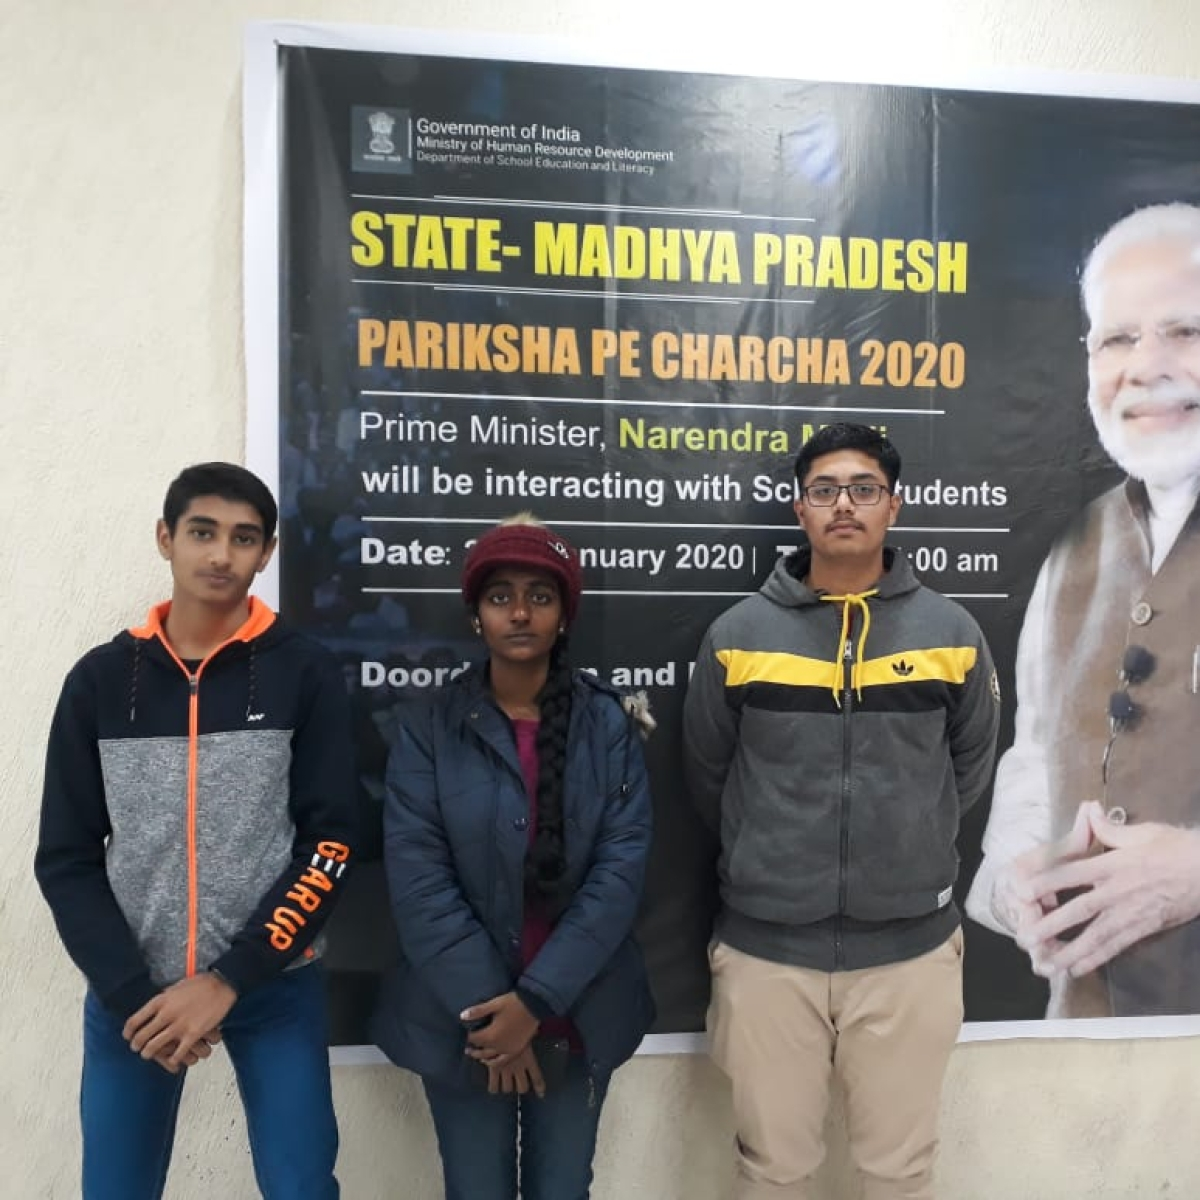 Indore trio heads to Pariksha Pe Charcha 2020 with PM